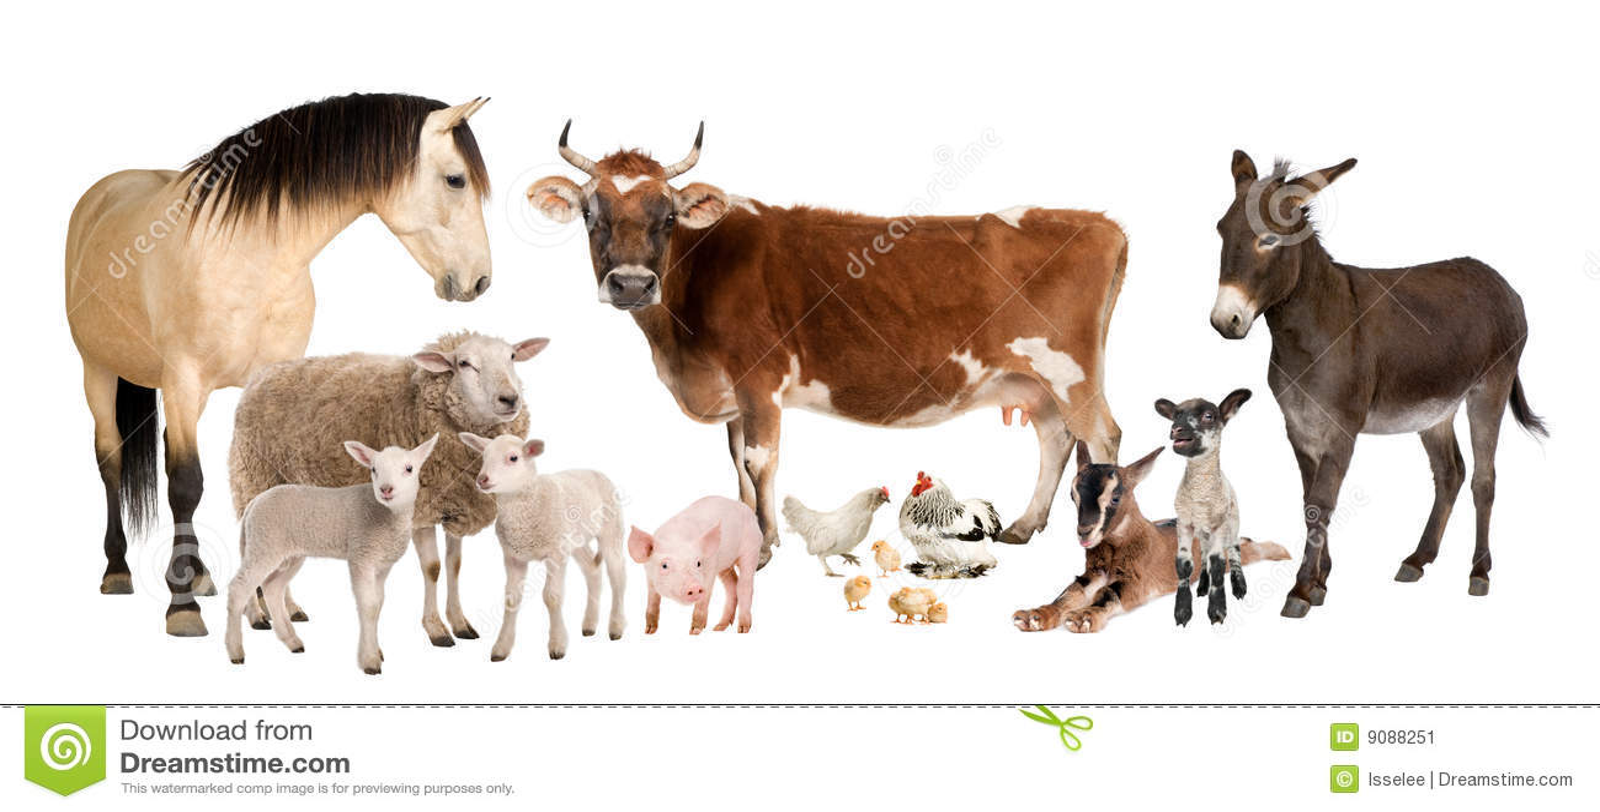 Human female livestock adult download